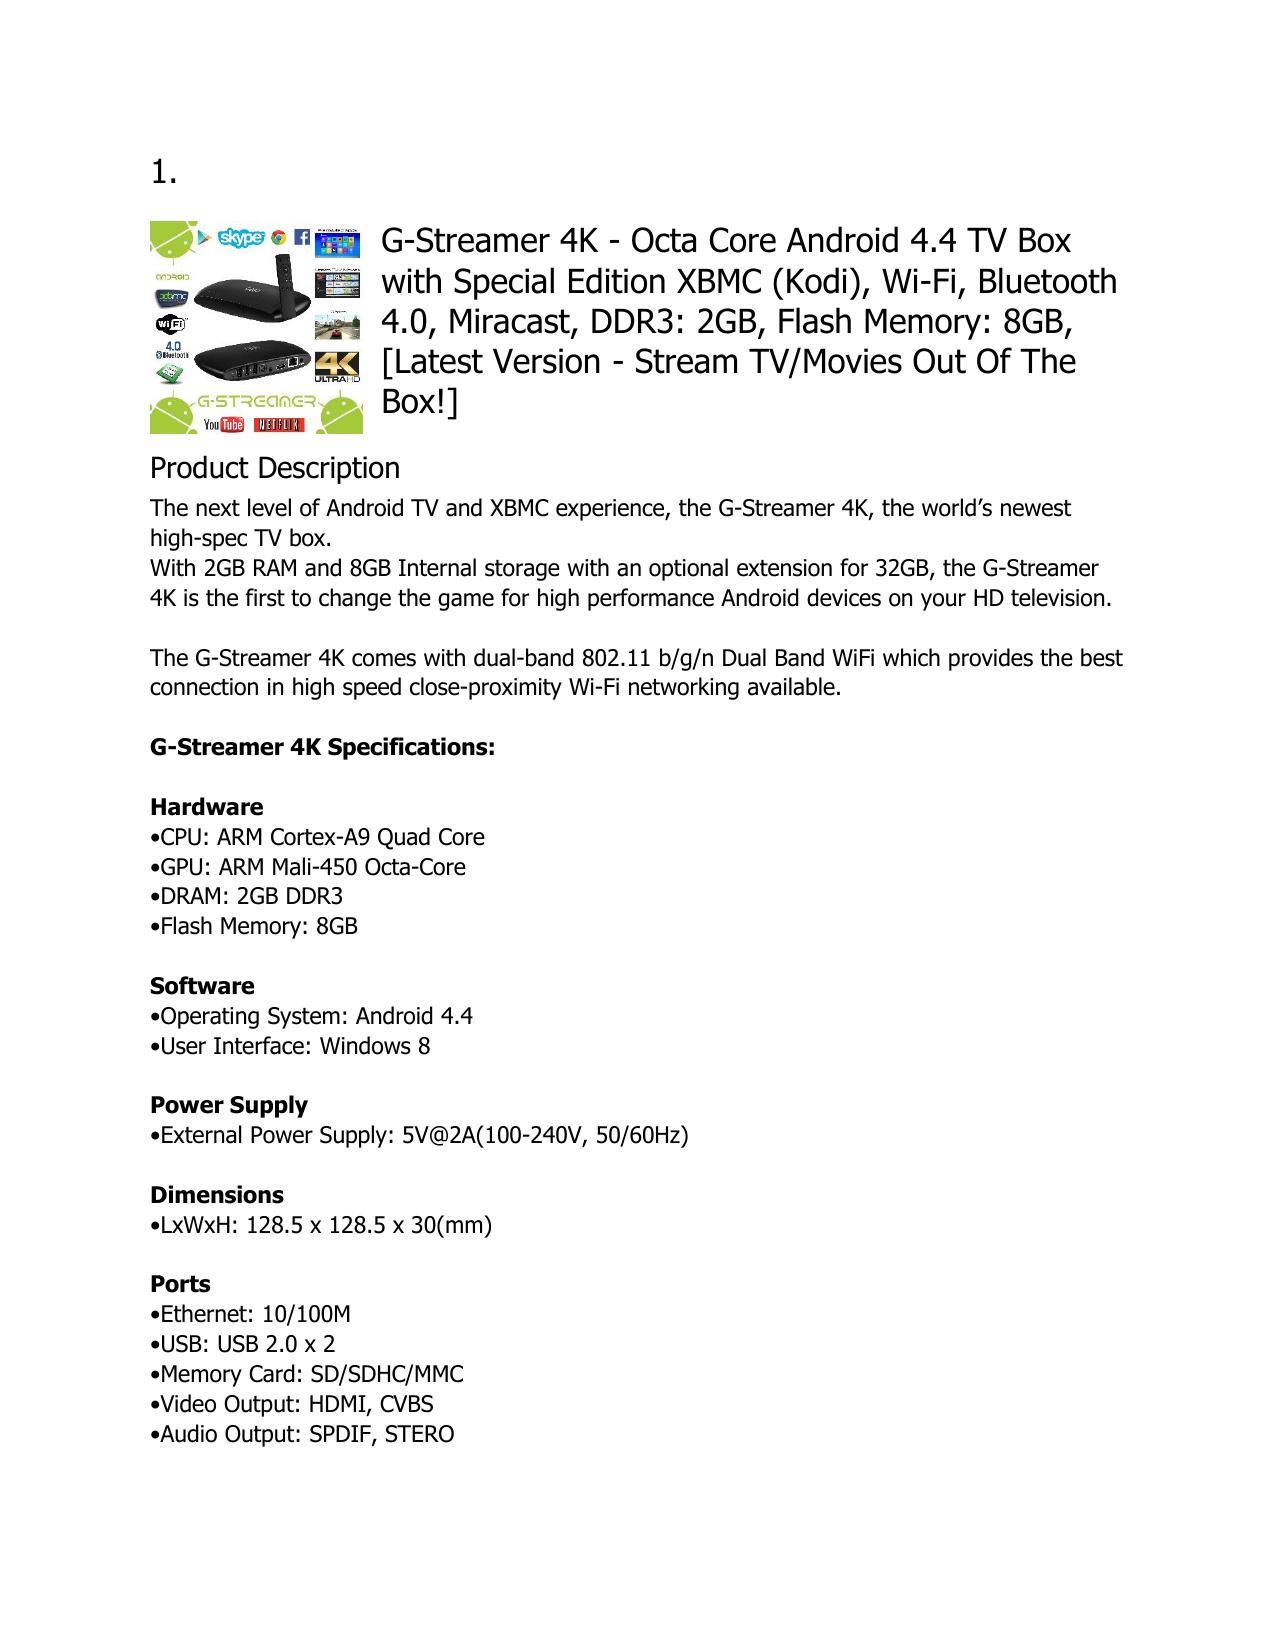 Octa Core Android 4 4 TV Box with Special Edition XBMC (Kodi